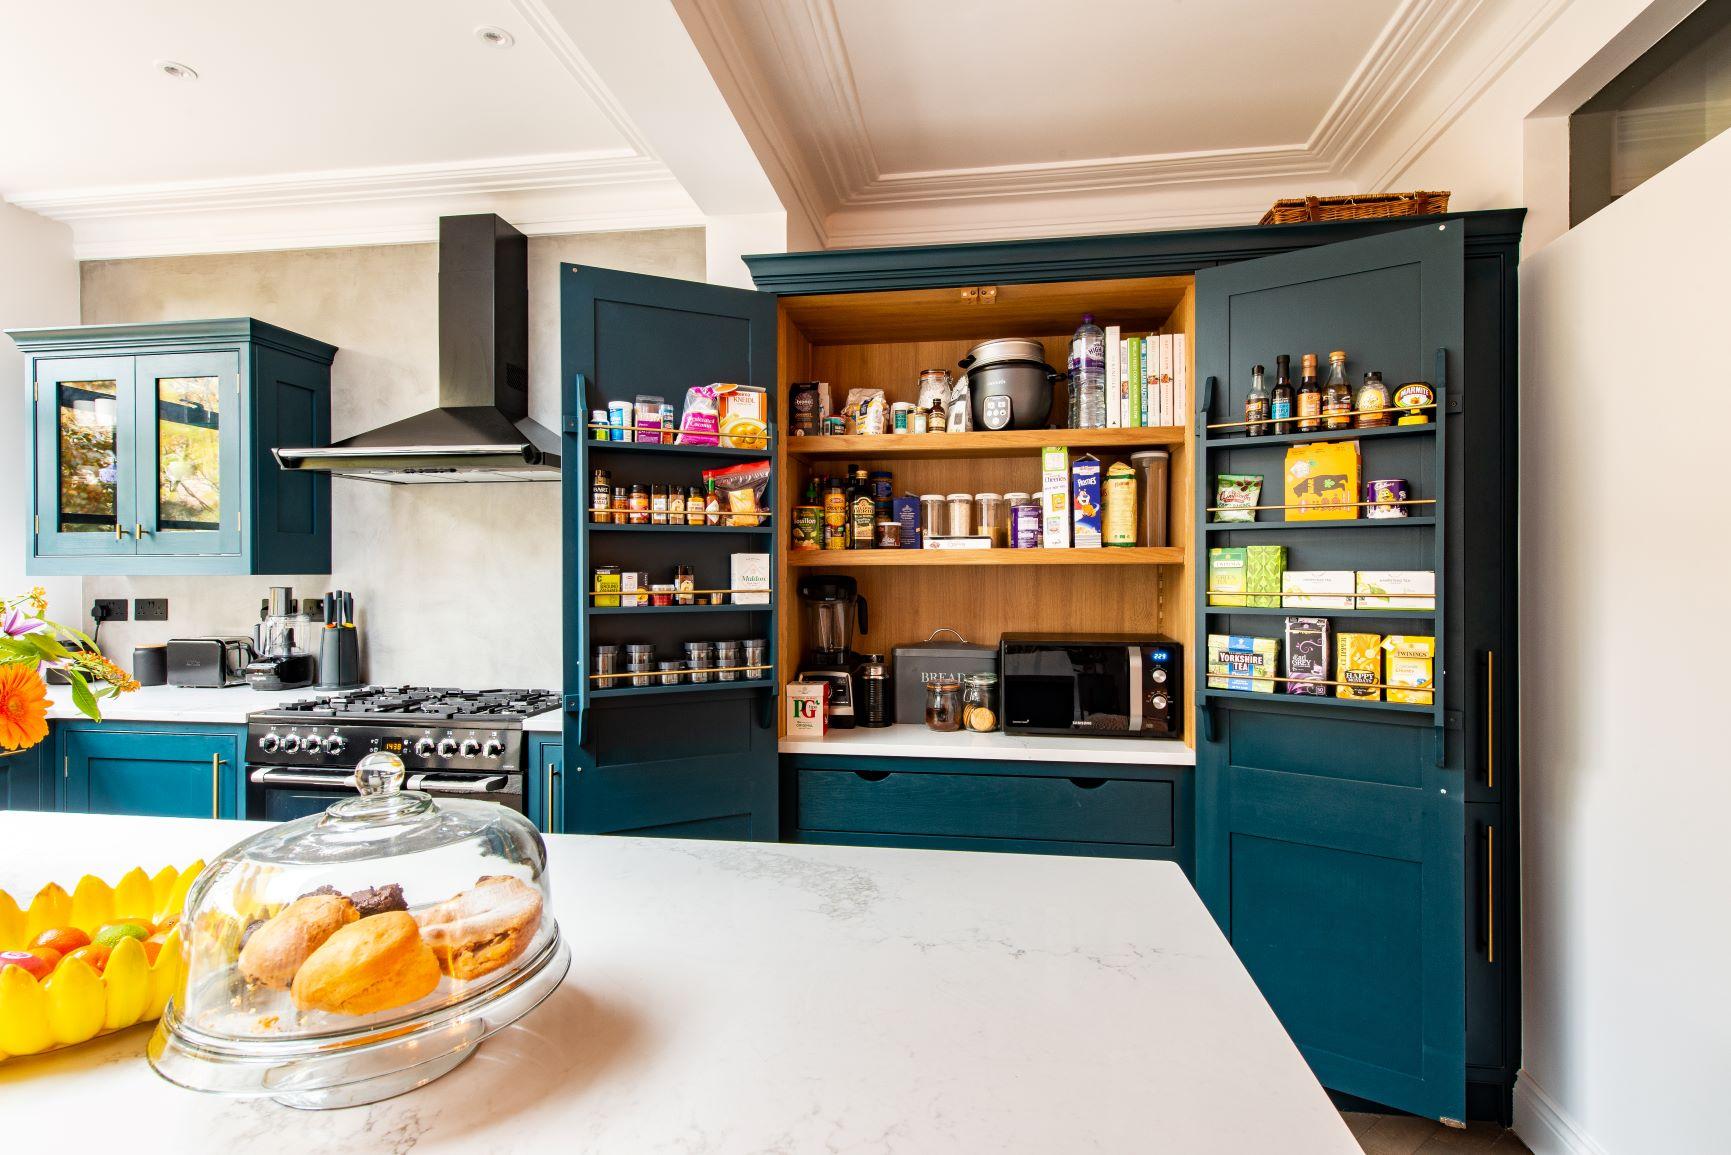 Lily Pebbles Kitchen